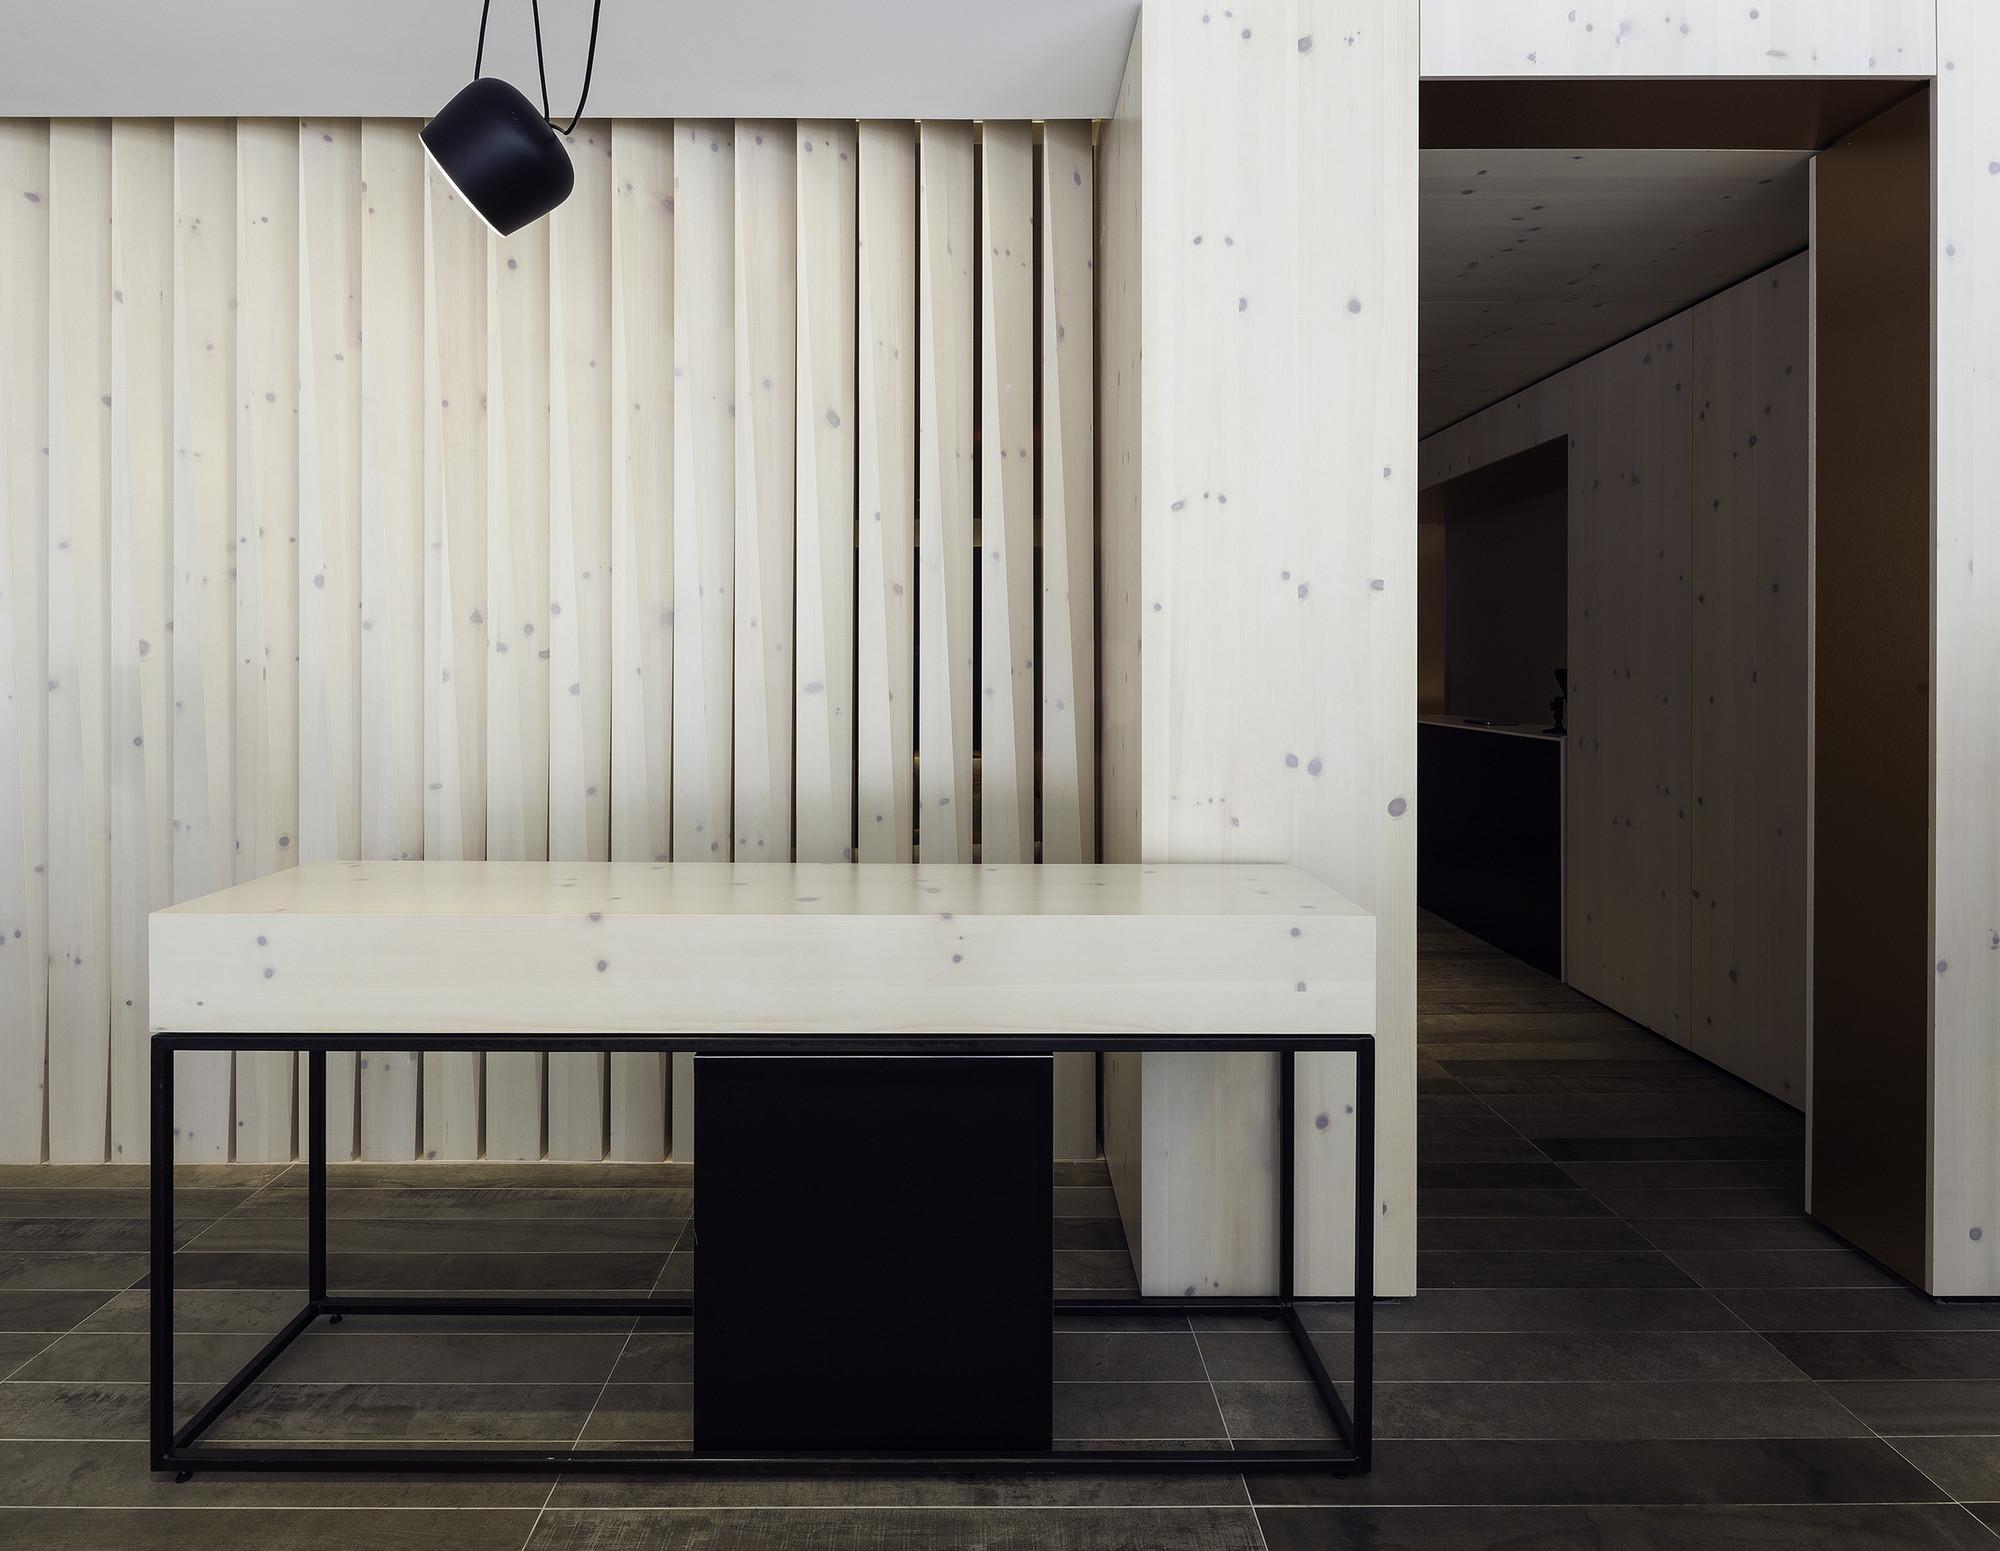 Gallery Of Peloton C Bernheimer Architecture 4